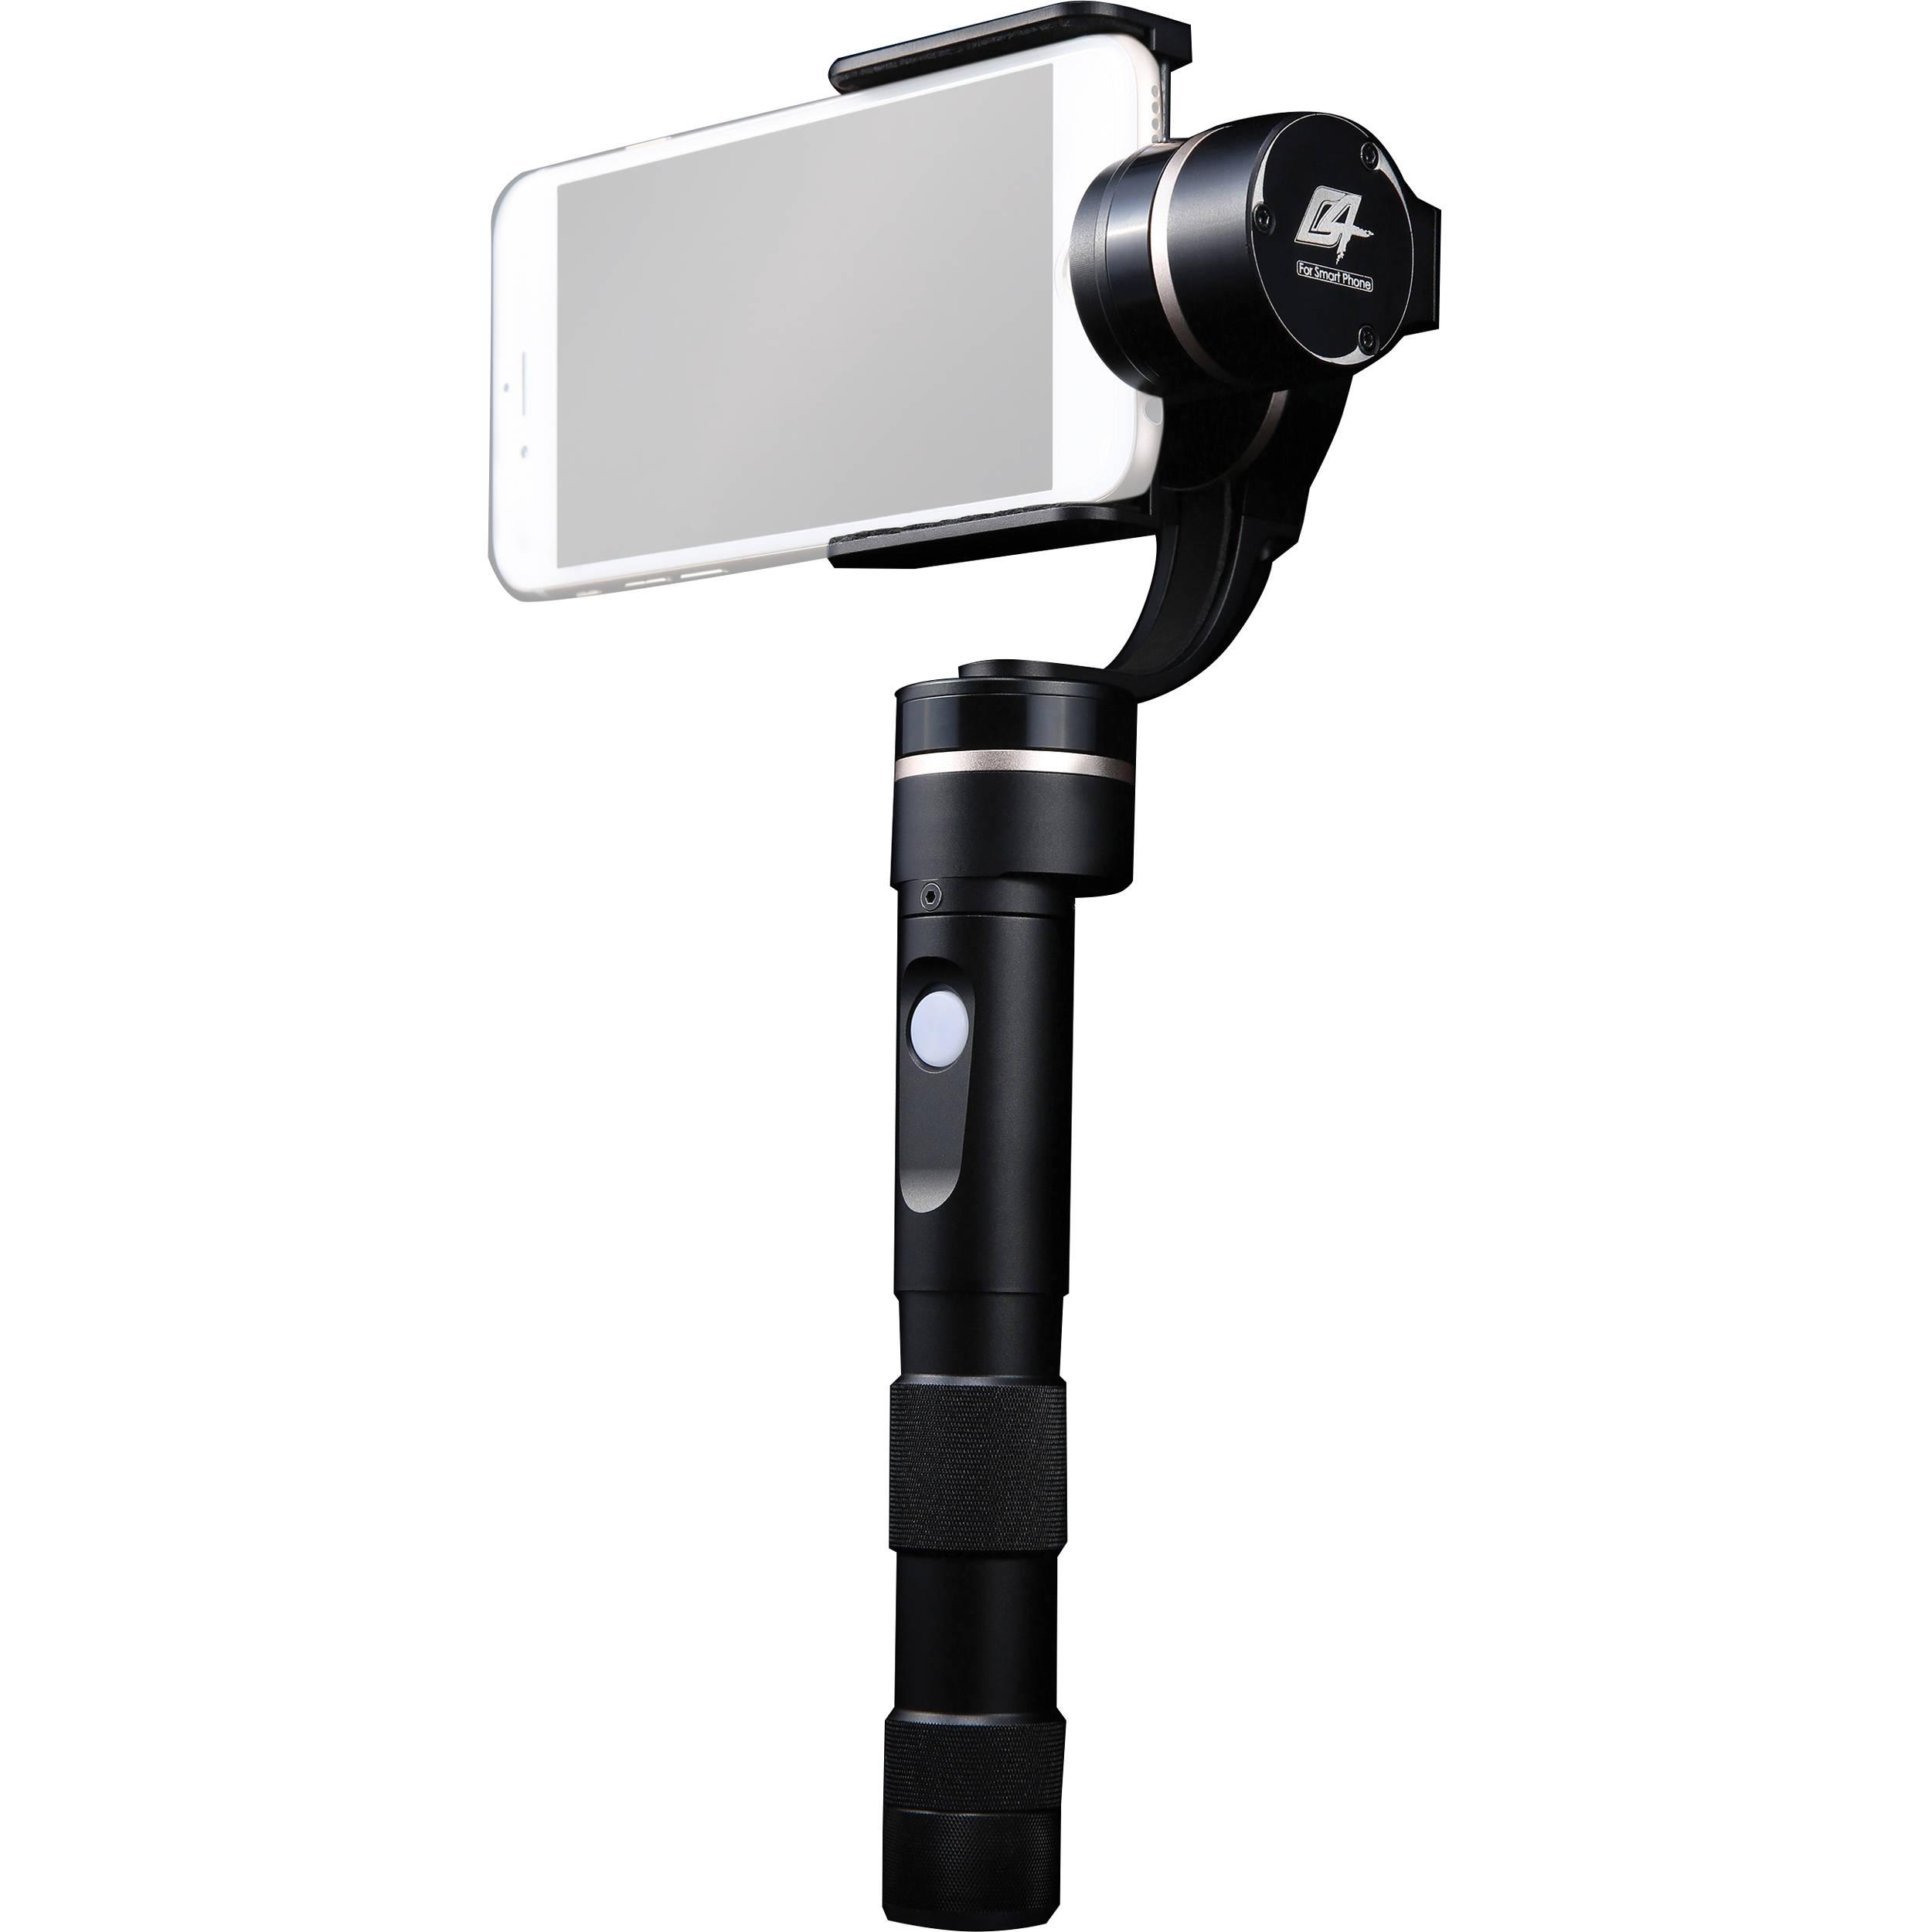 Feiyu G4 3 Axis Handheld Gimbal For Smartphones Gm G4 P B Amp H